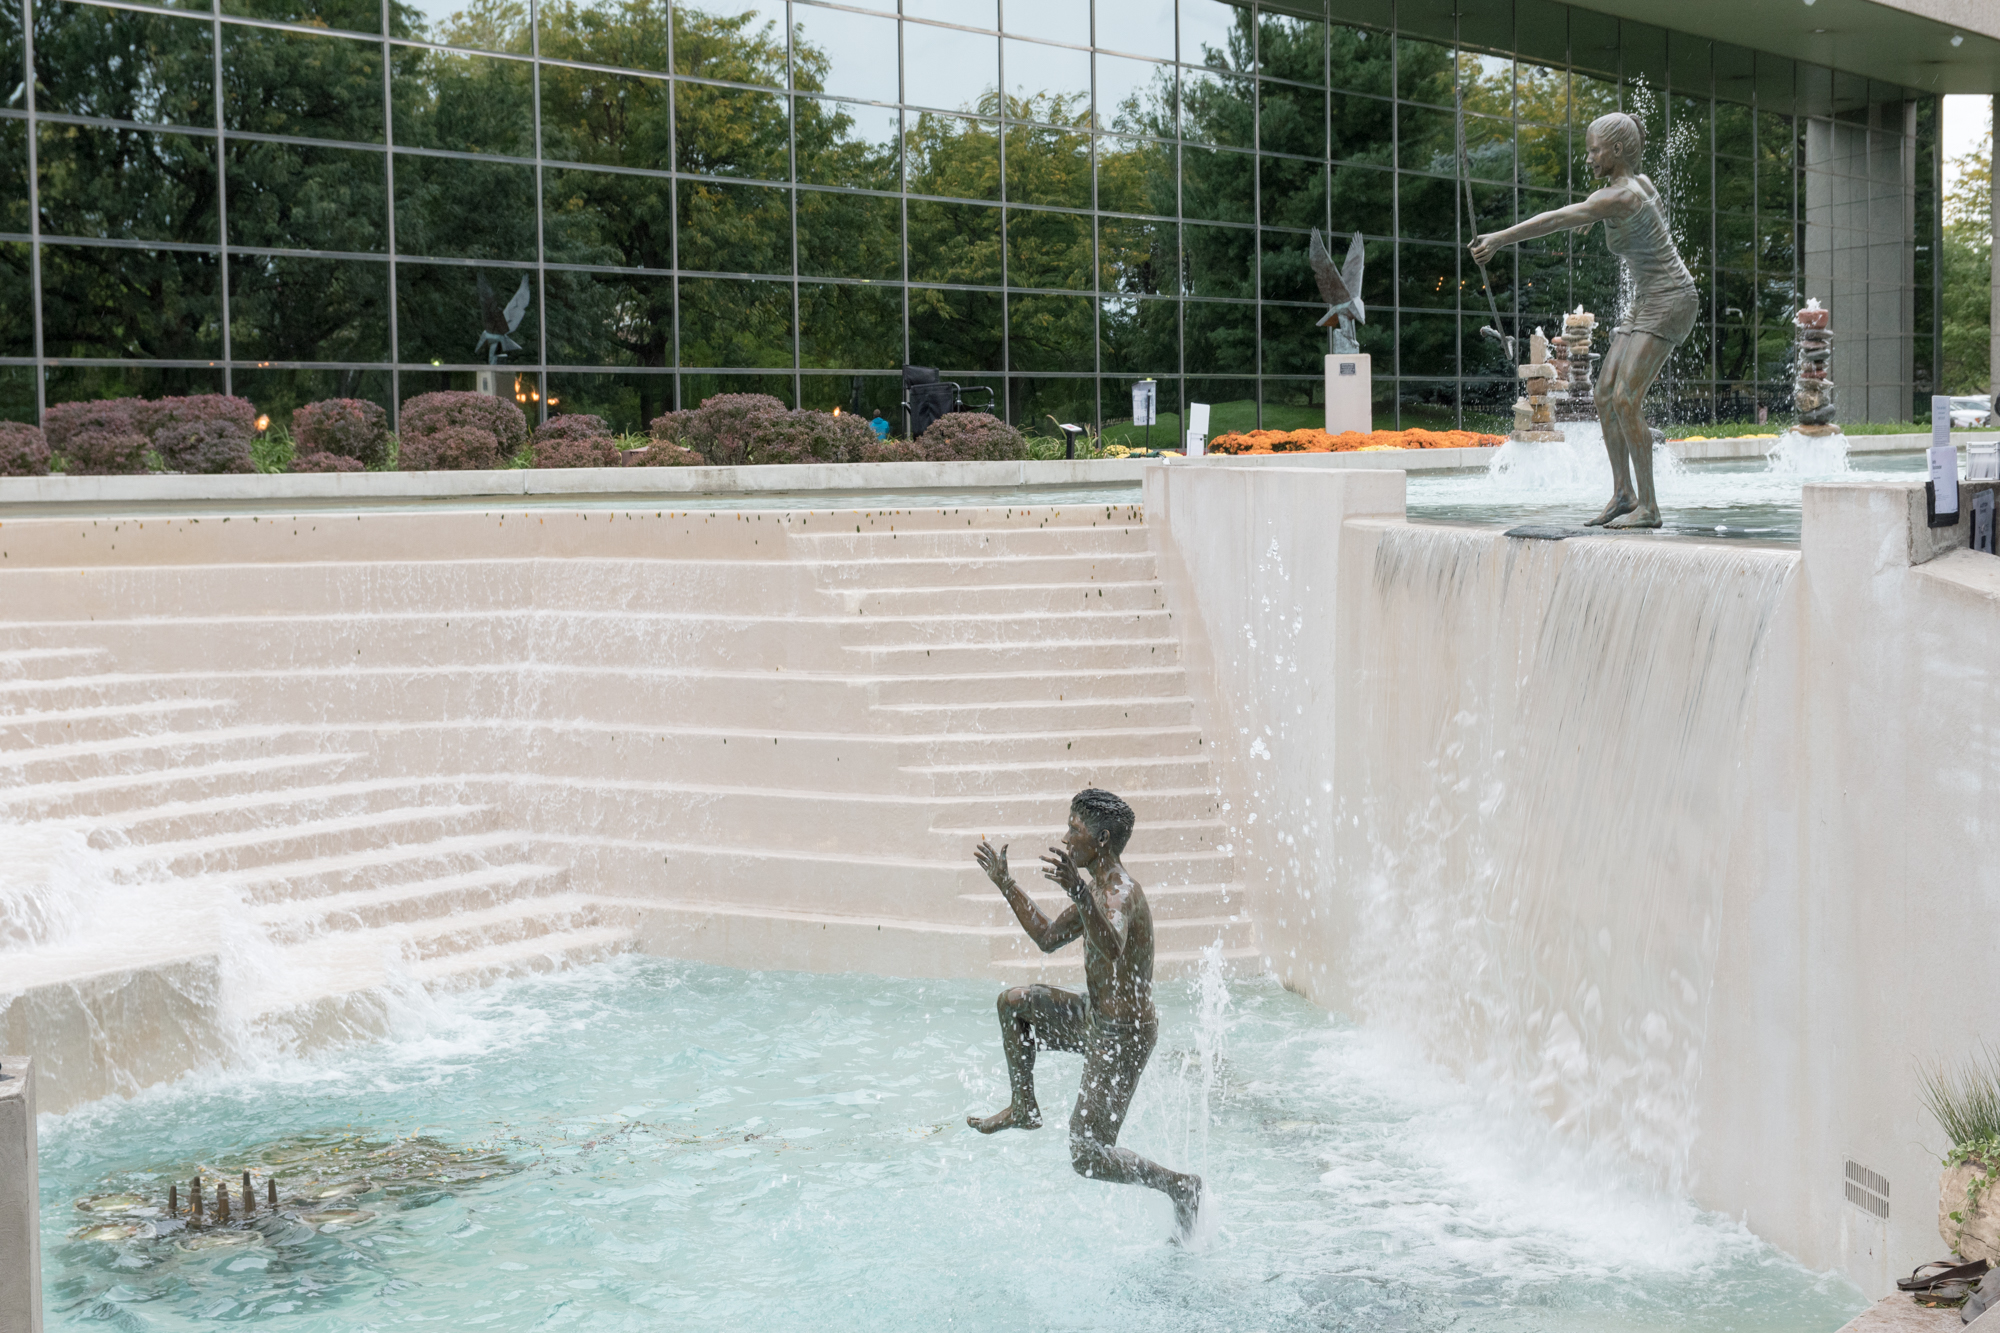 Reach and Splash | Andy Sacksteder